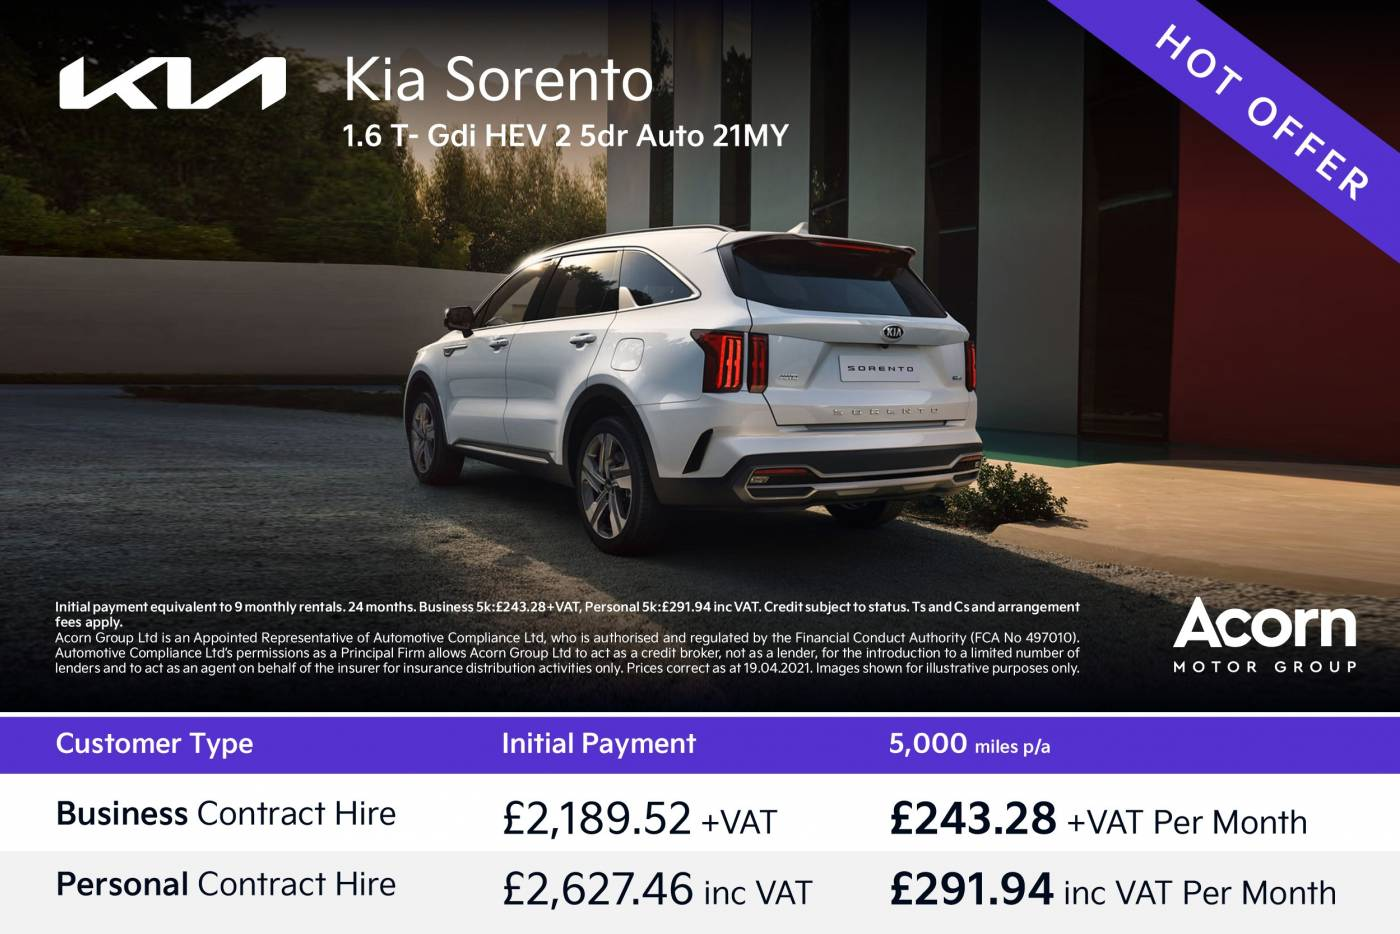 Kia -Hot Offer - weekly change